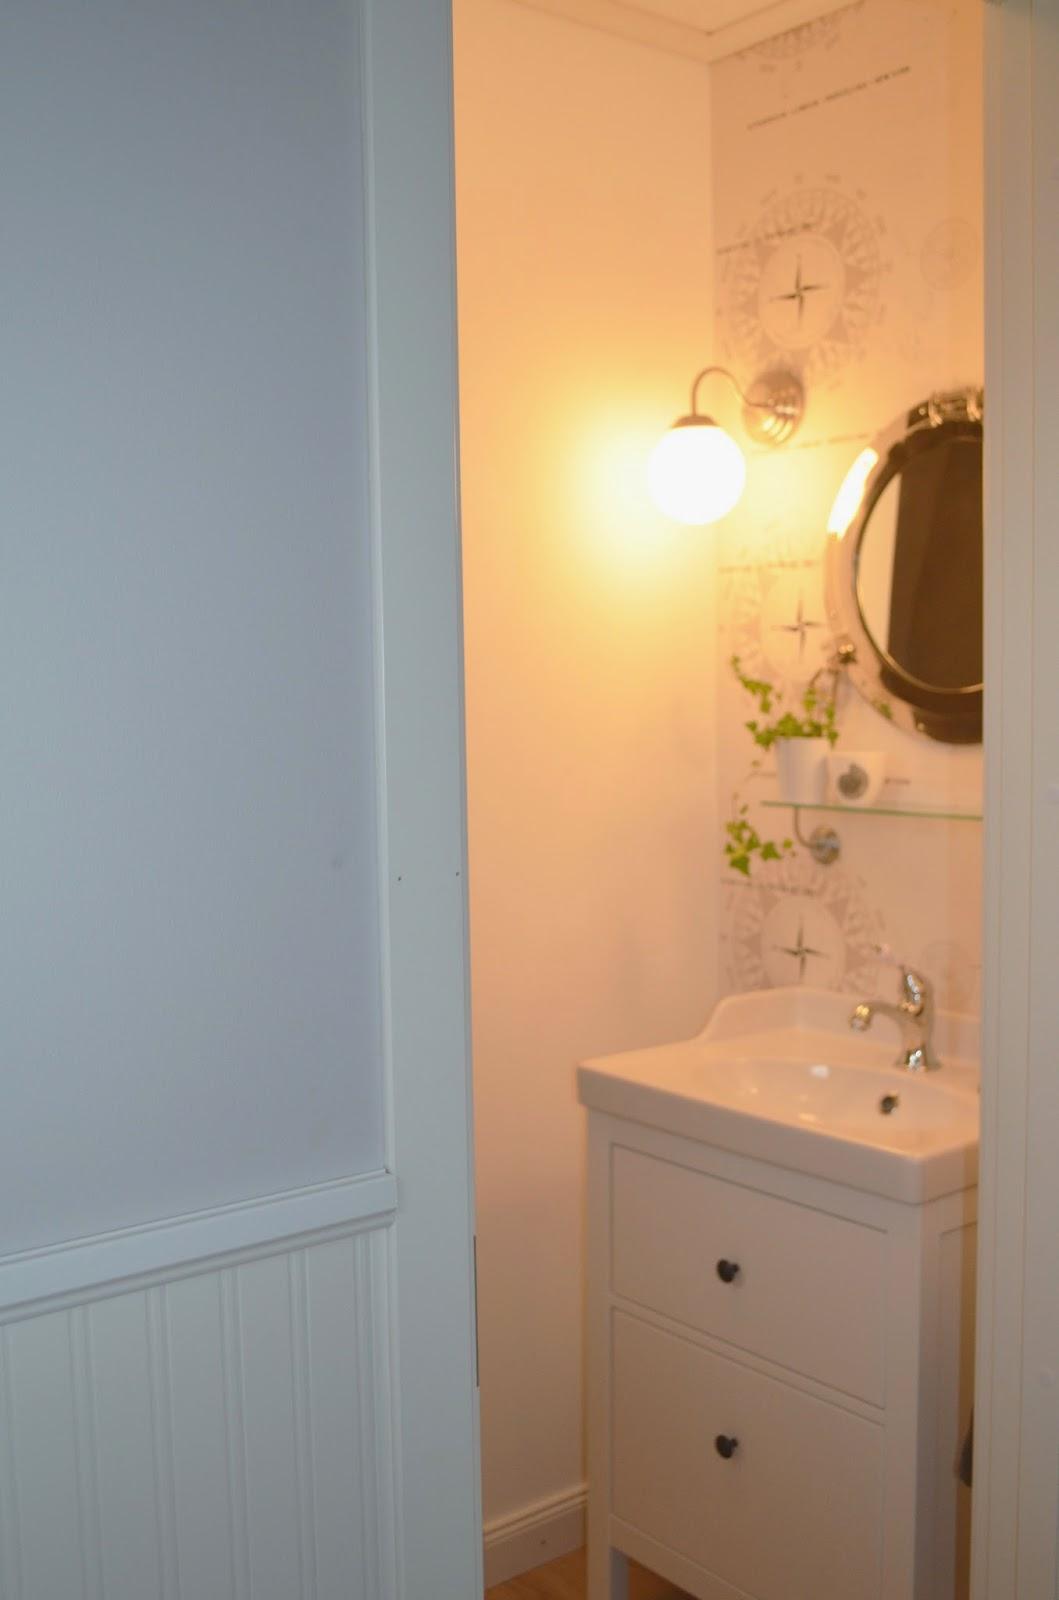 hausbau archive deko hus. Black Bedroom Furniture Sets. Home Design Ideas